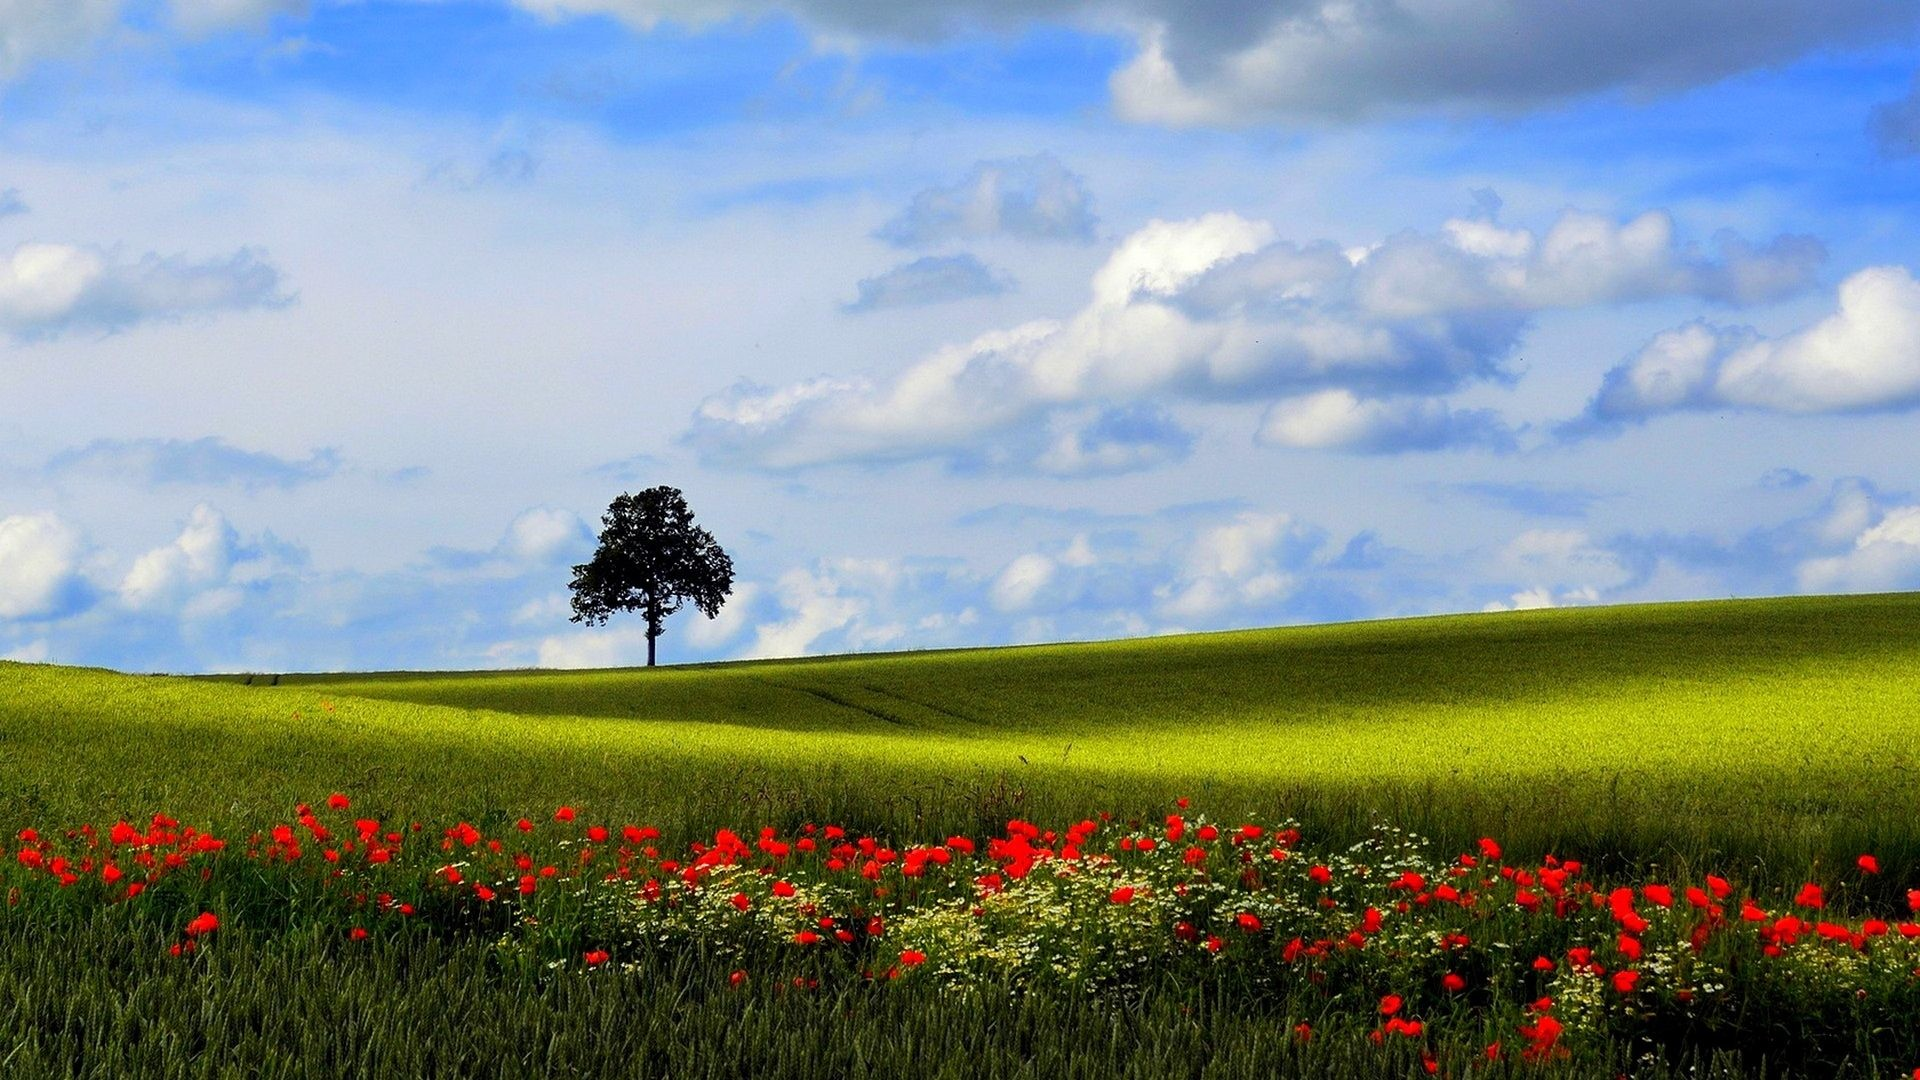 Poppy Tag – Poppy Nature Poppies Tree Field Lavender Fields Desktop  Backgrounds for HD 16: